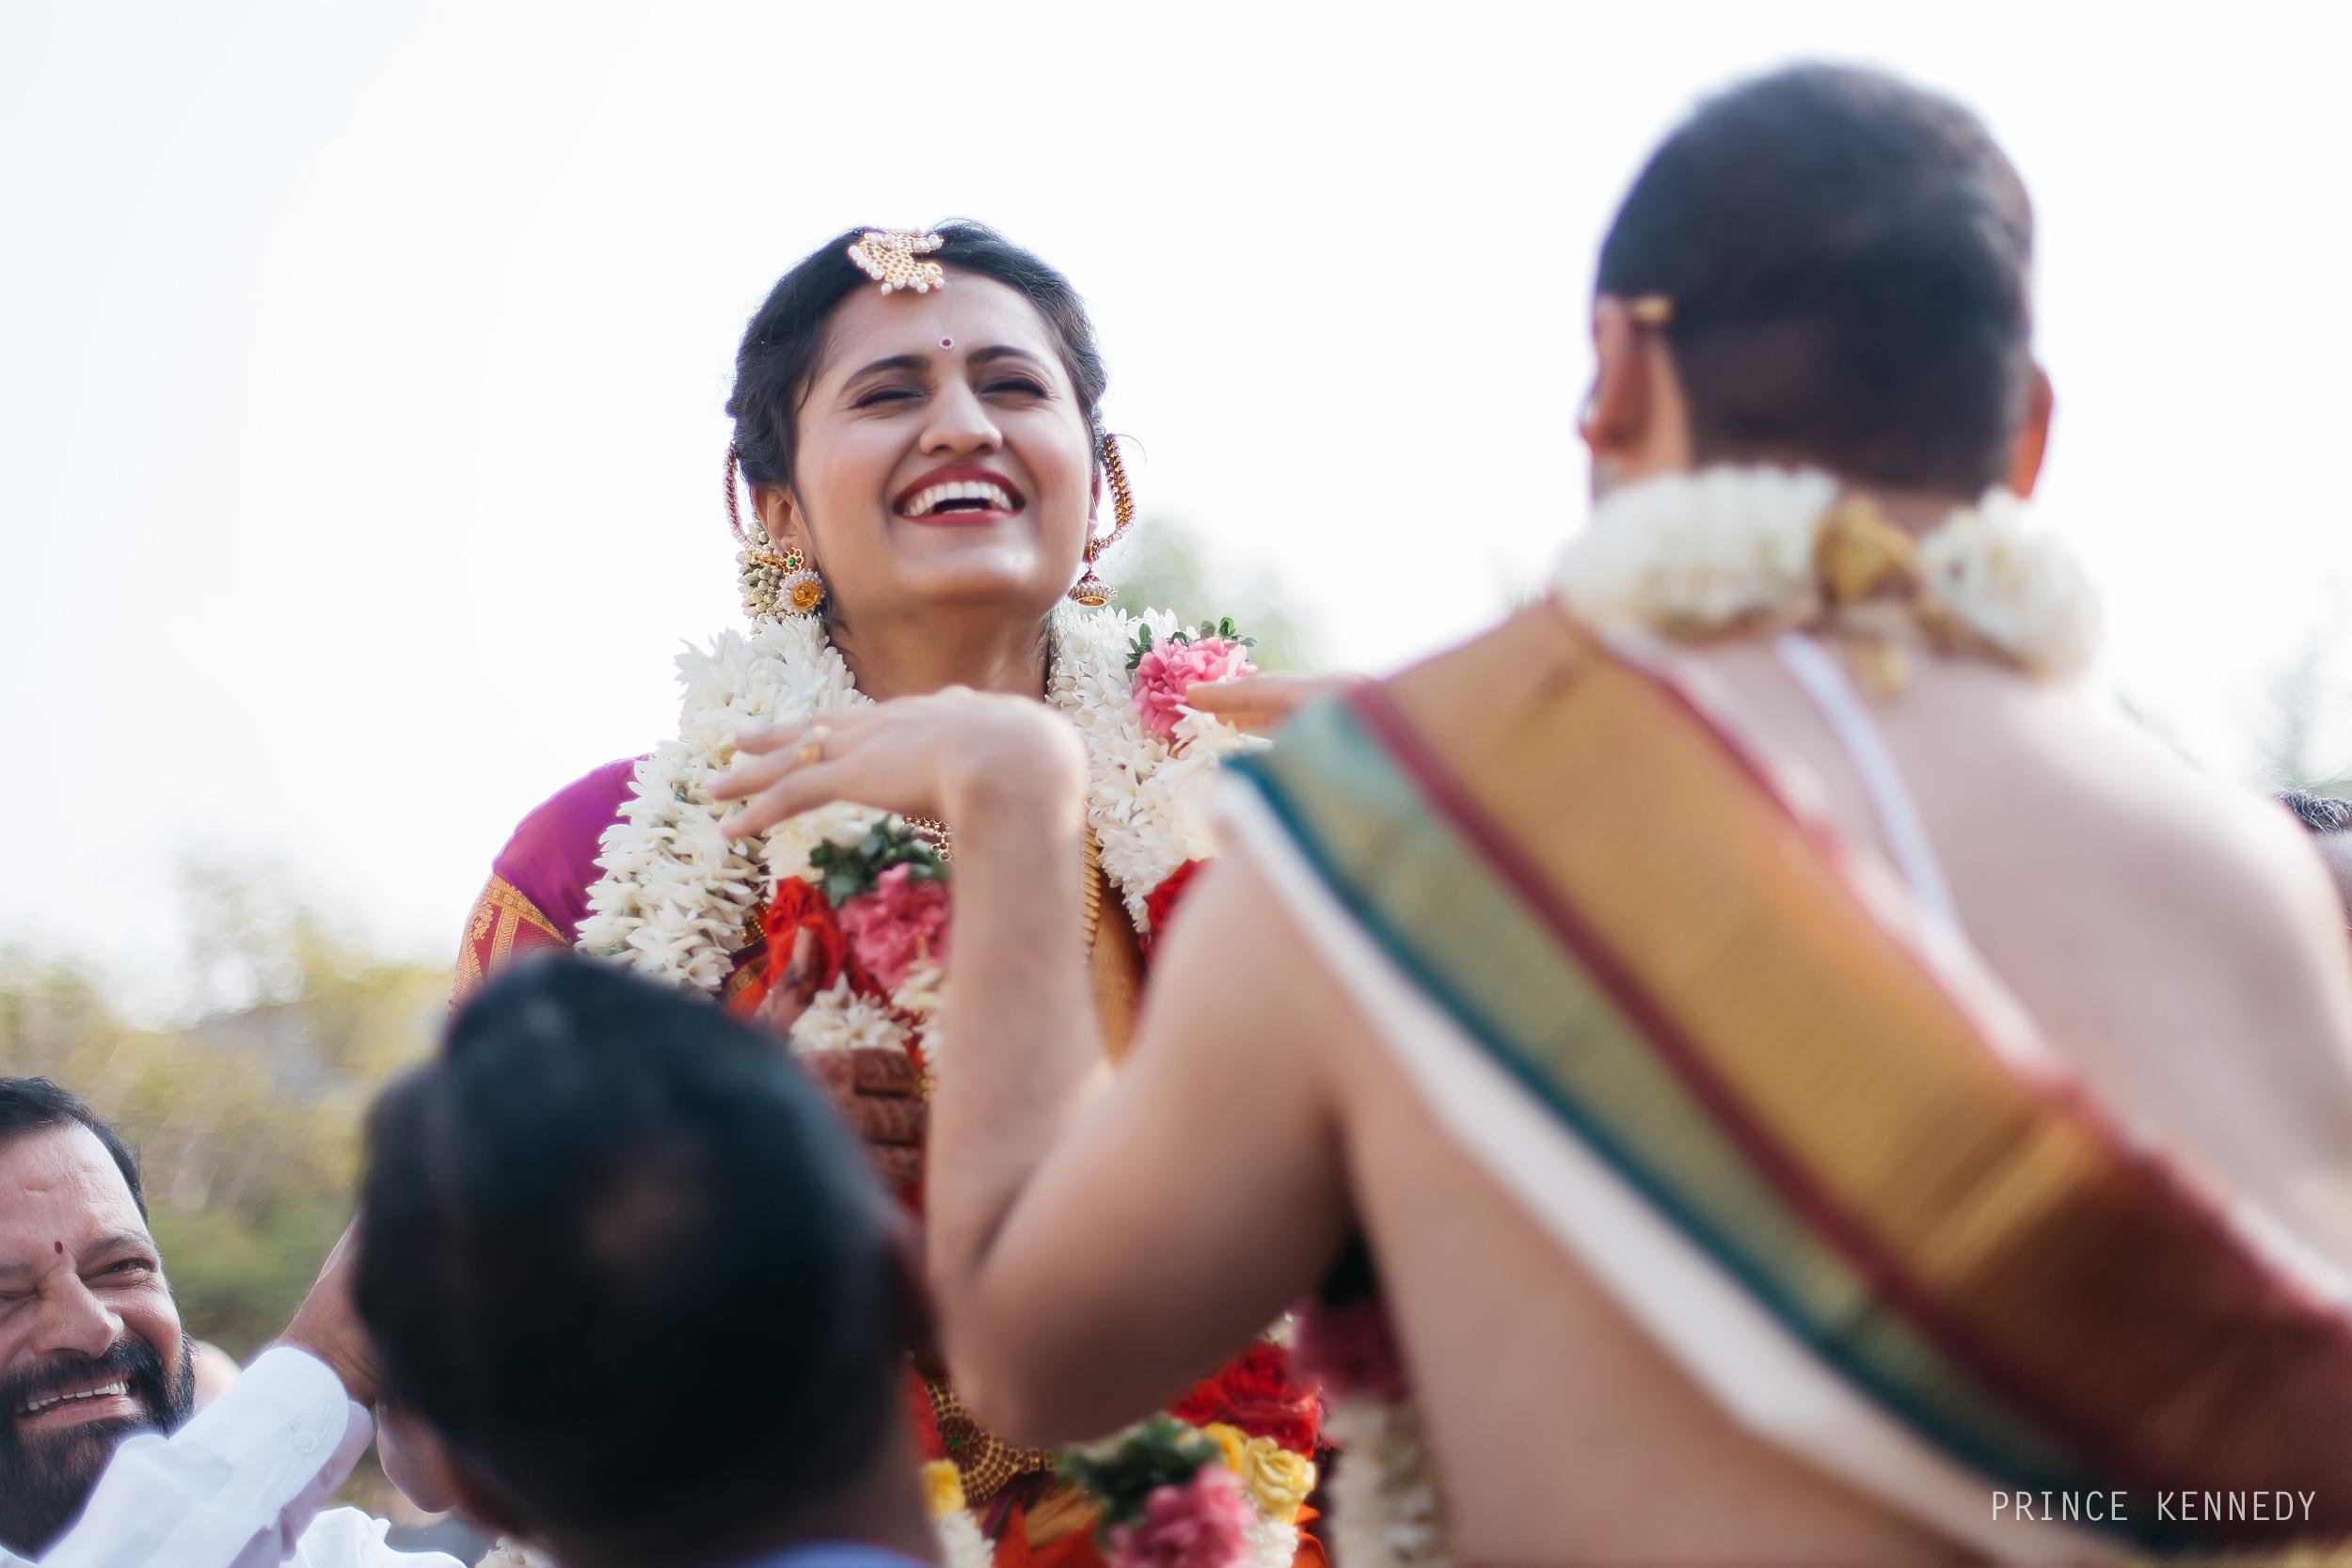 Athmajja-Nithesh-Engagement-Couple-Portrait-Portraiture-Wedding-Couple-Portrait-Chennai-Photographer-Candid-Photography-Destination-Best-Prince-Kennedy-Photography-96.jpg